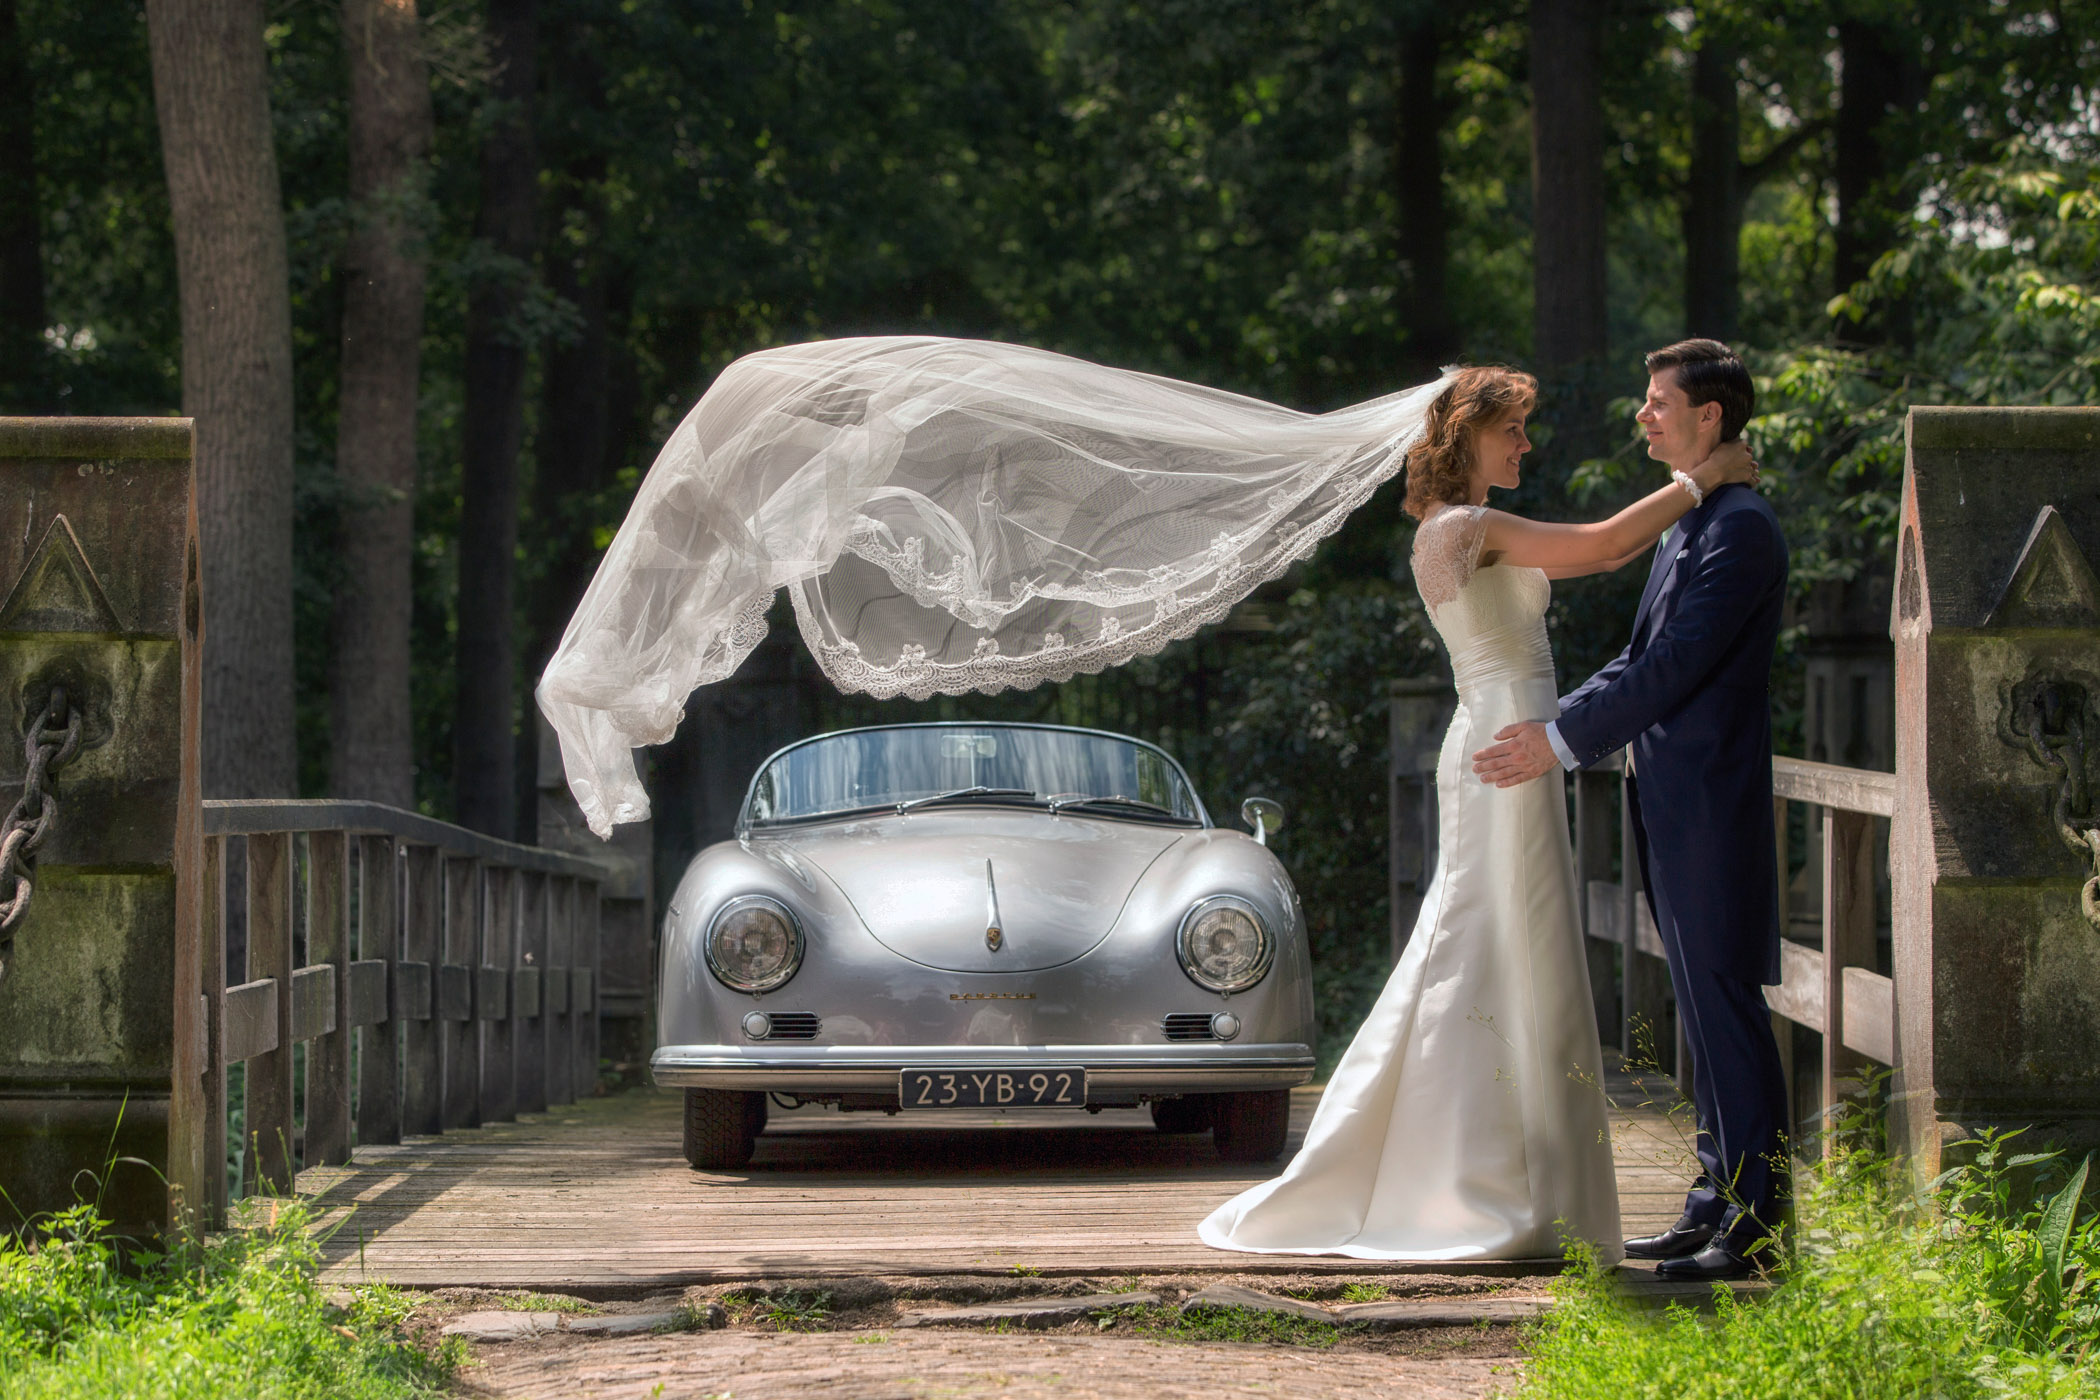 Bruidsfoto met bewegende sluier.